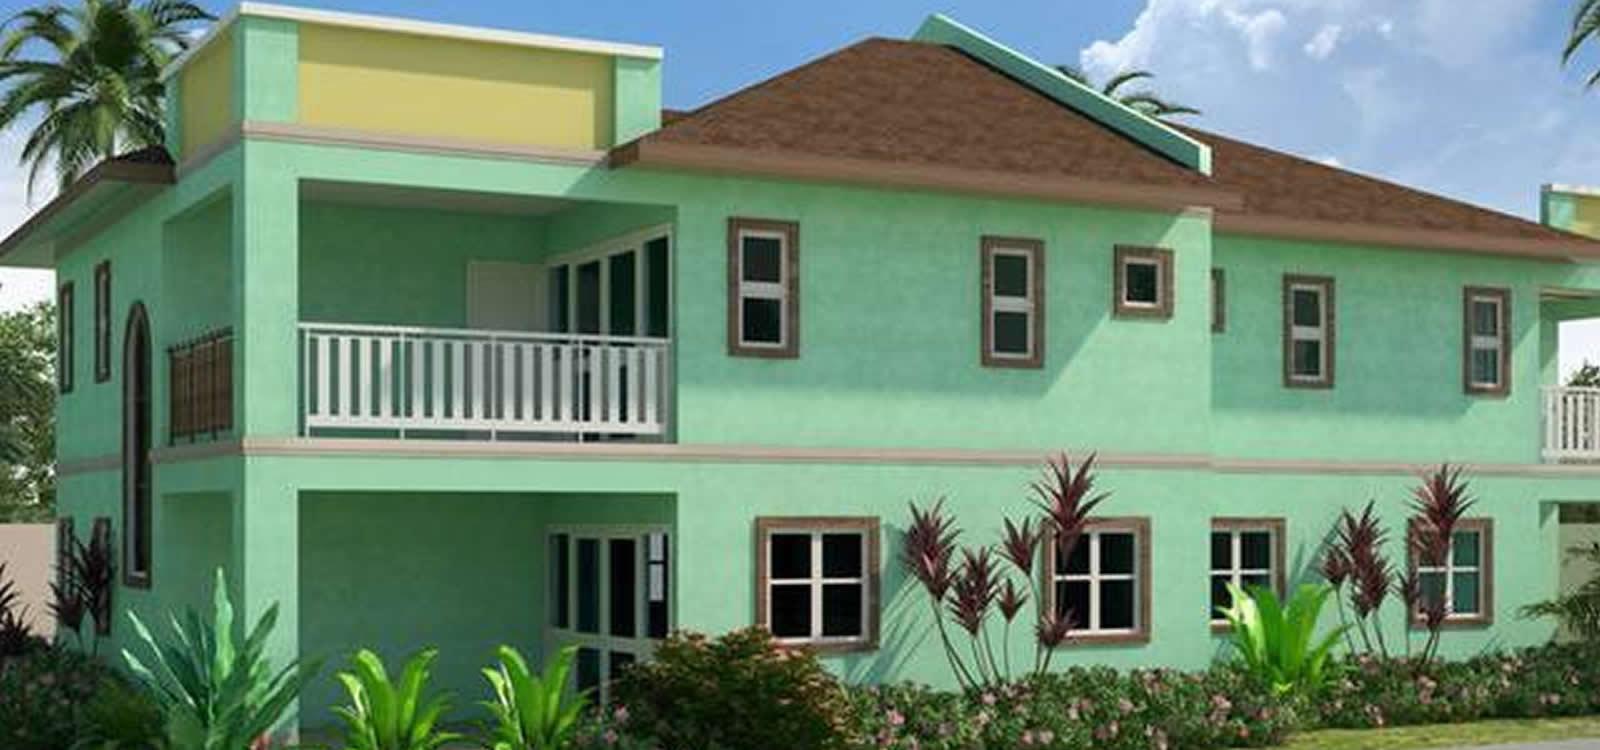 4 bedroom homes for sale  mammee bay  ocho rios  jamaica